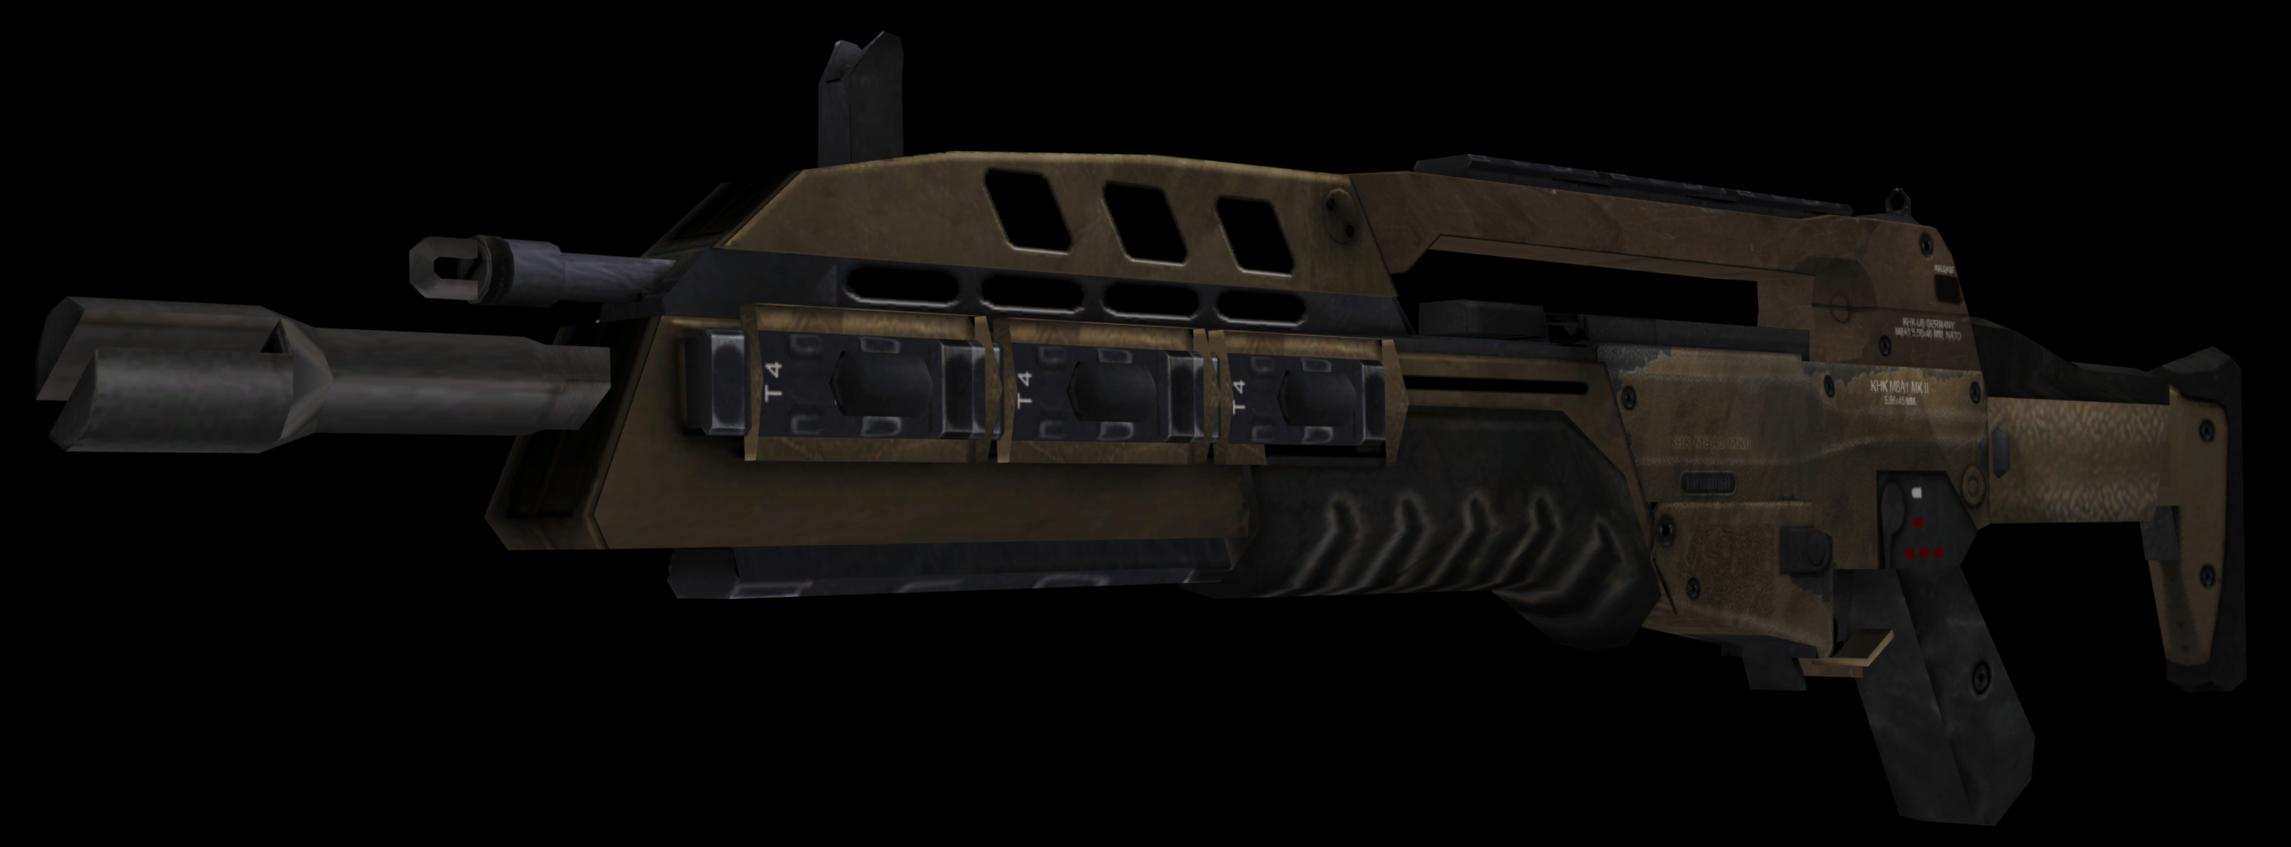 File:M8A1 model BOII.png